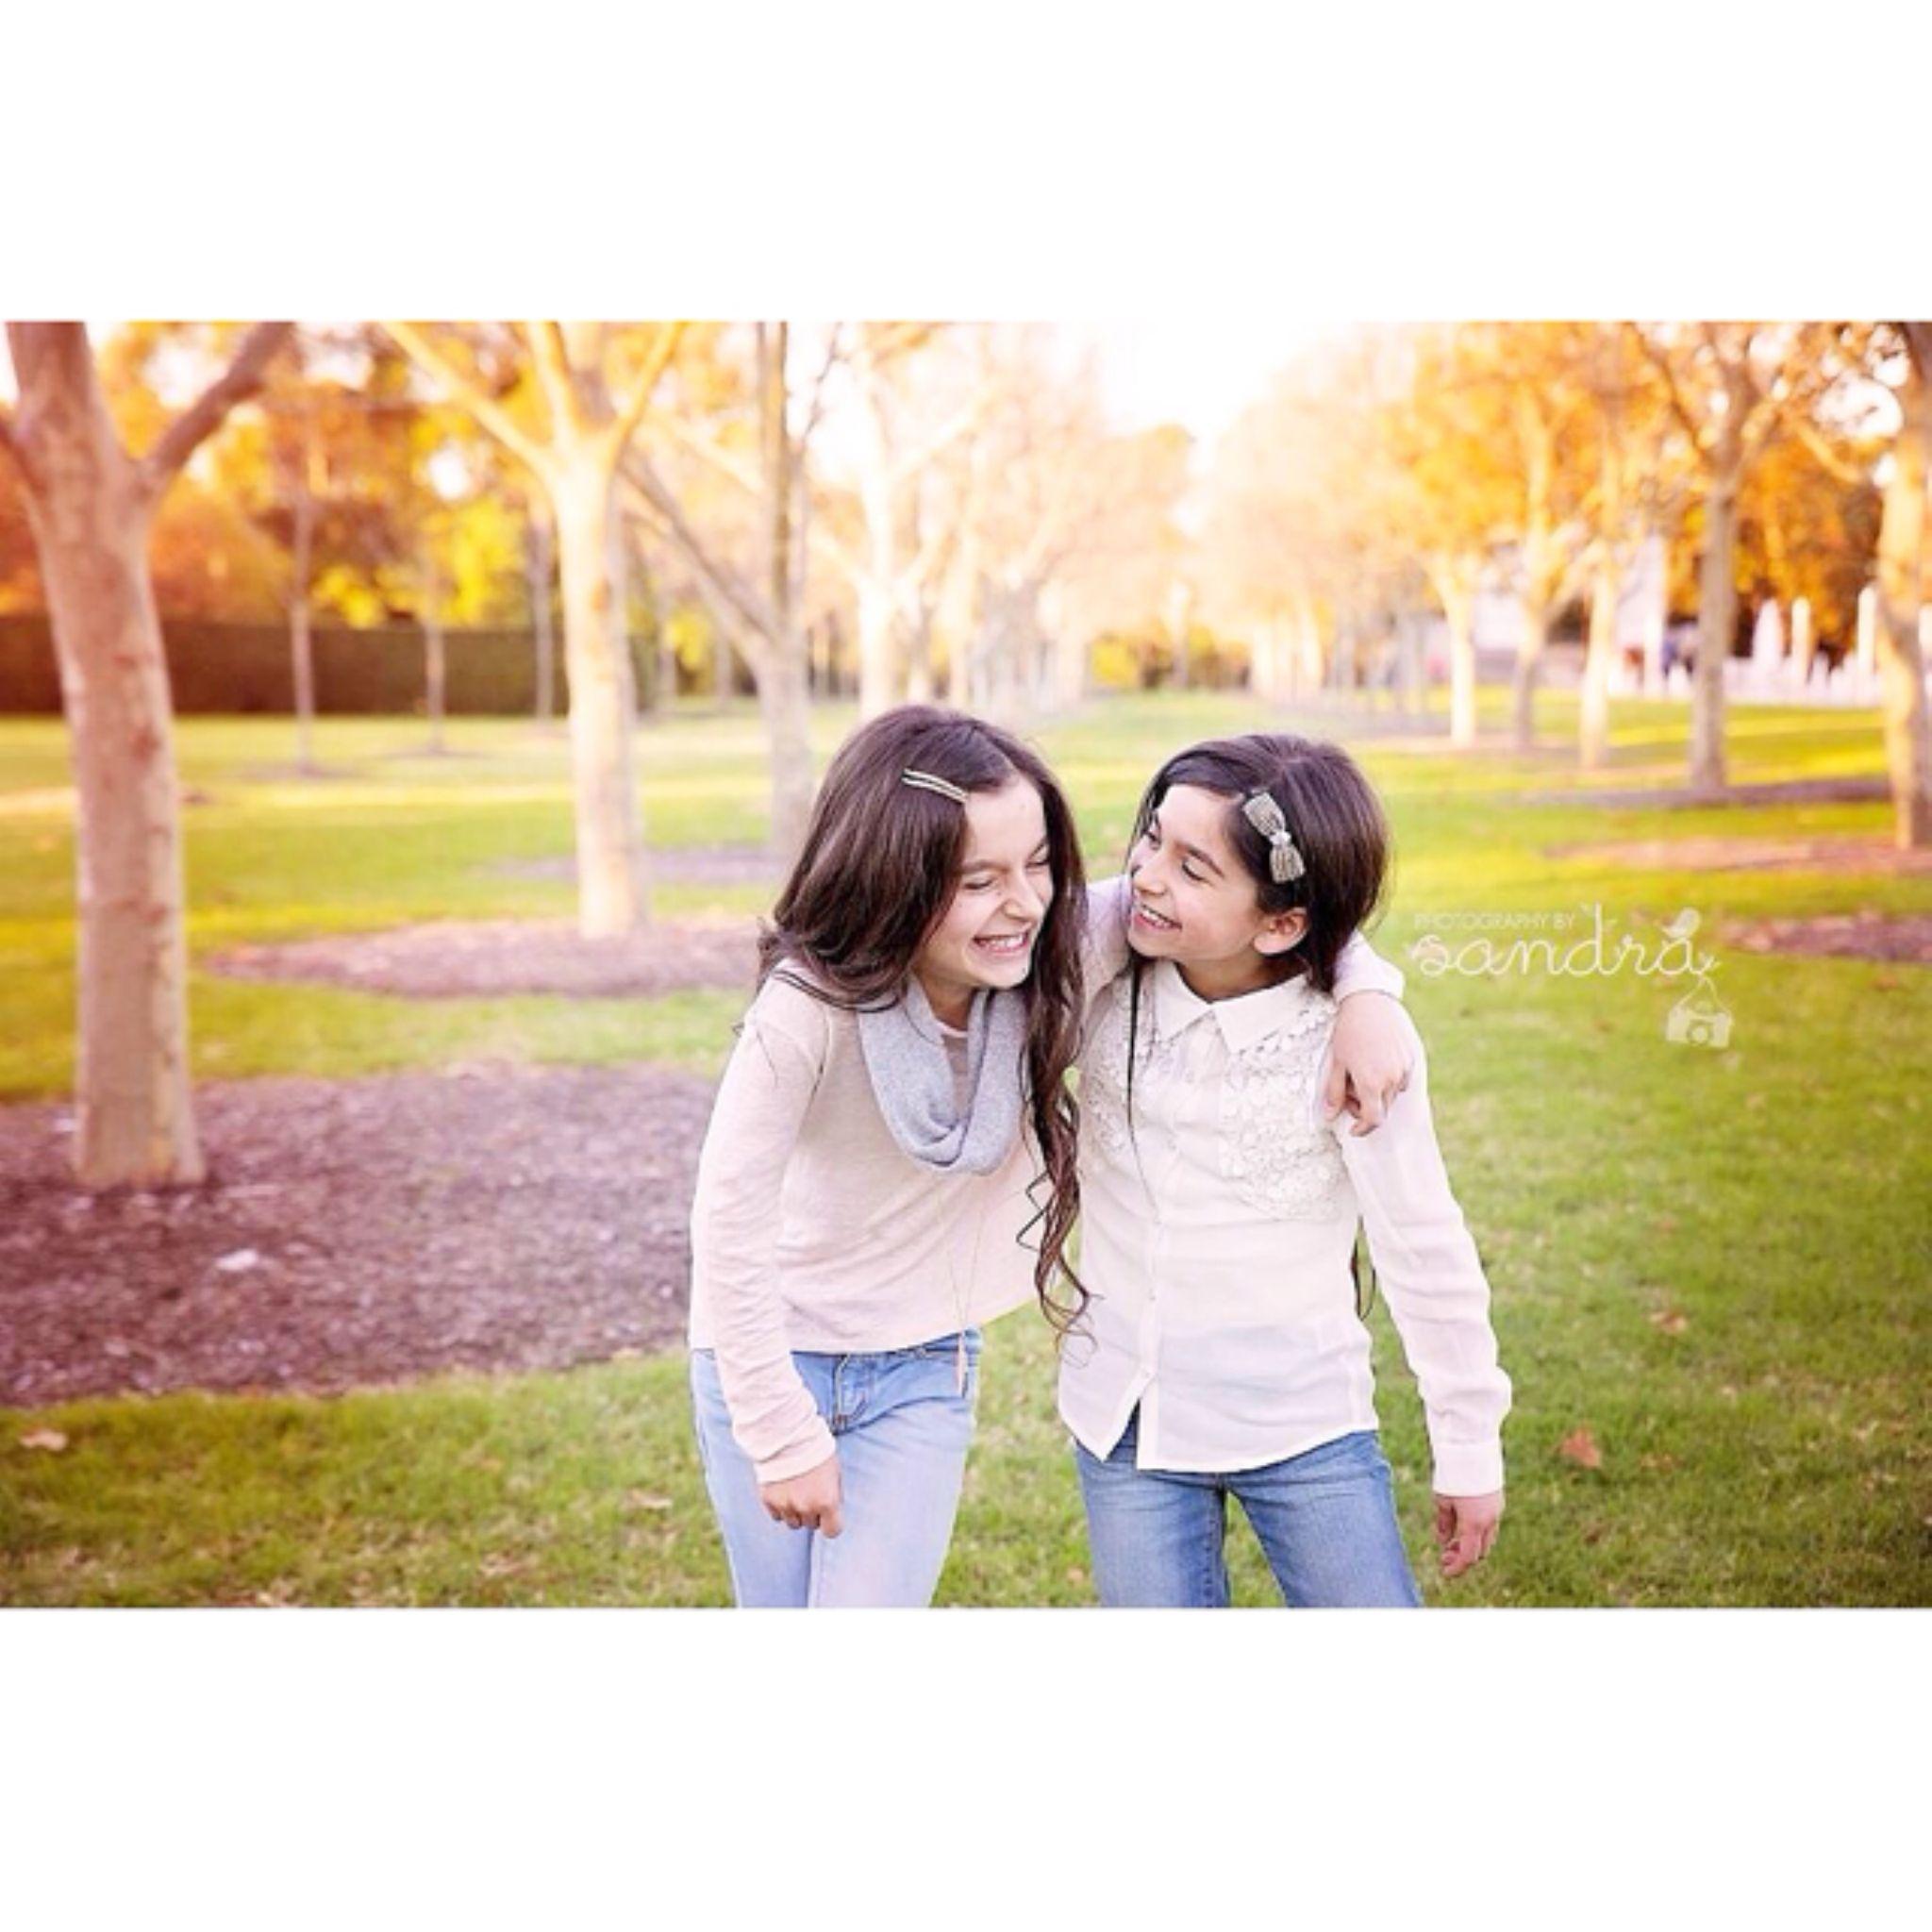 sisters for life by Sandra El-Ayoubi